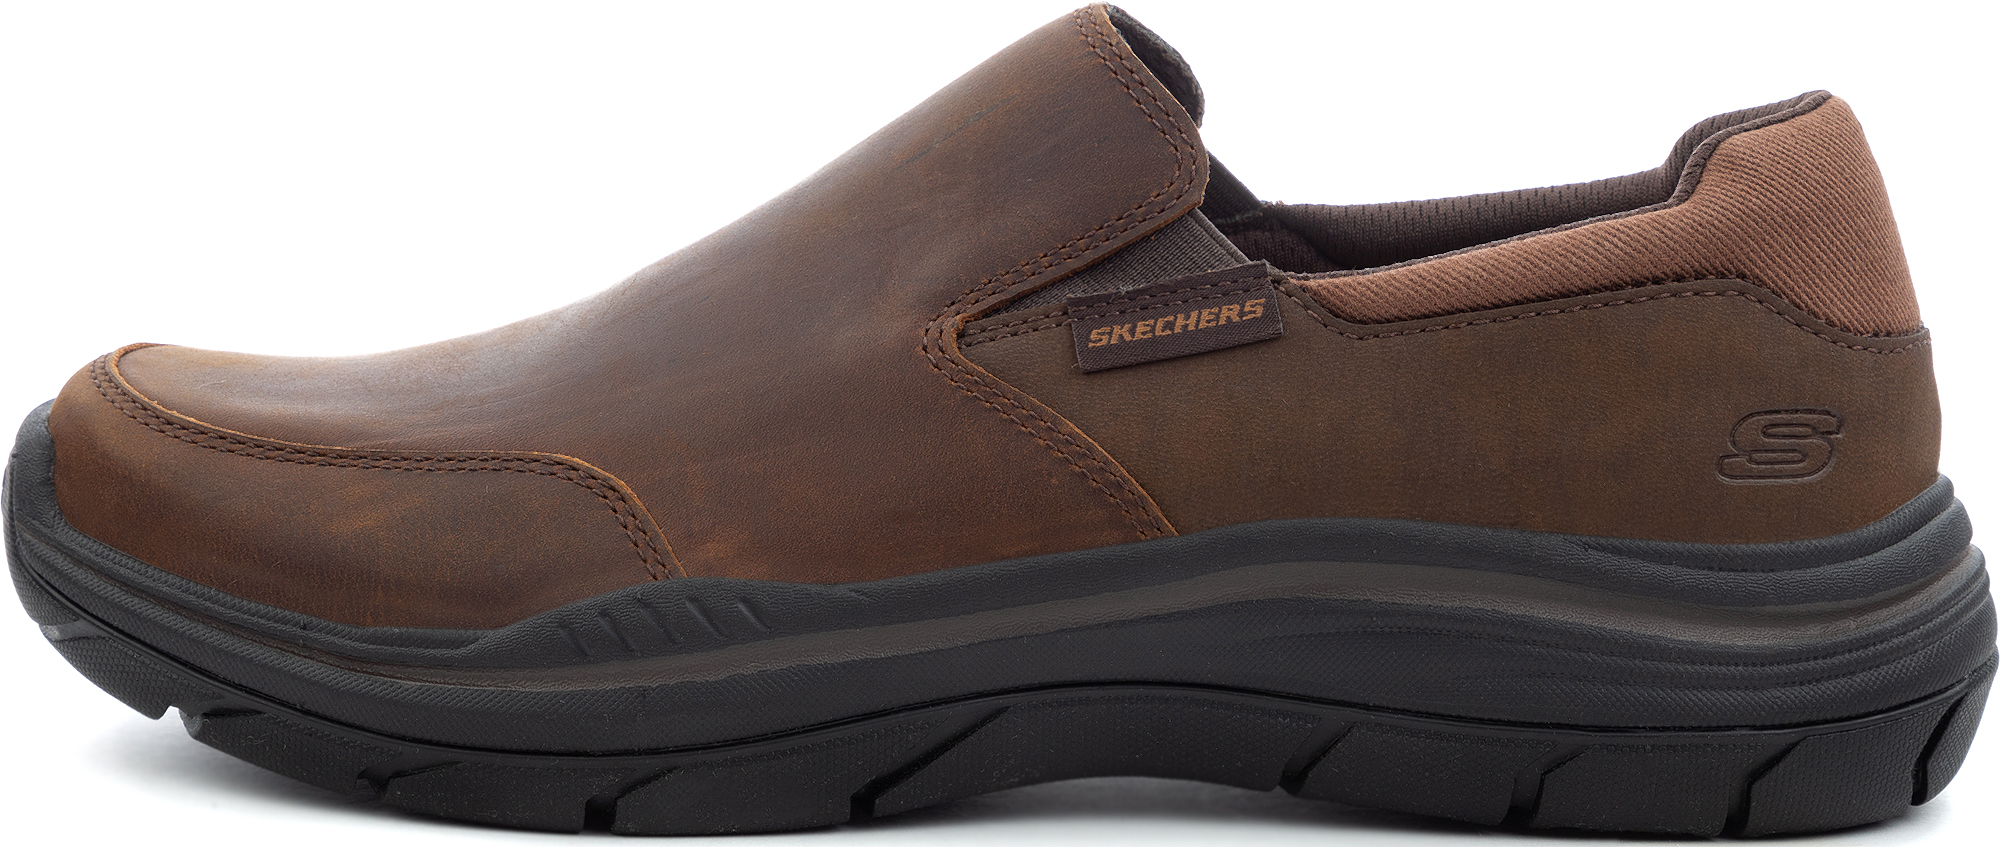 Skechers Ботинки мужские Expected 2.0 Olego, размер 45